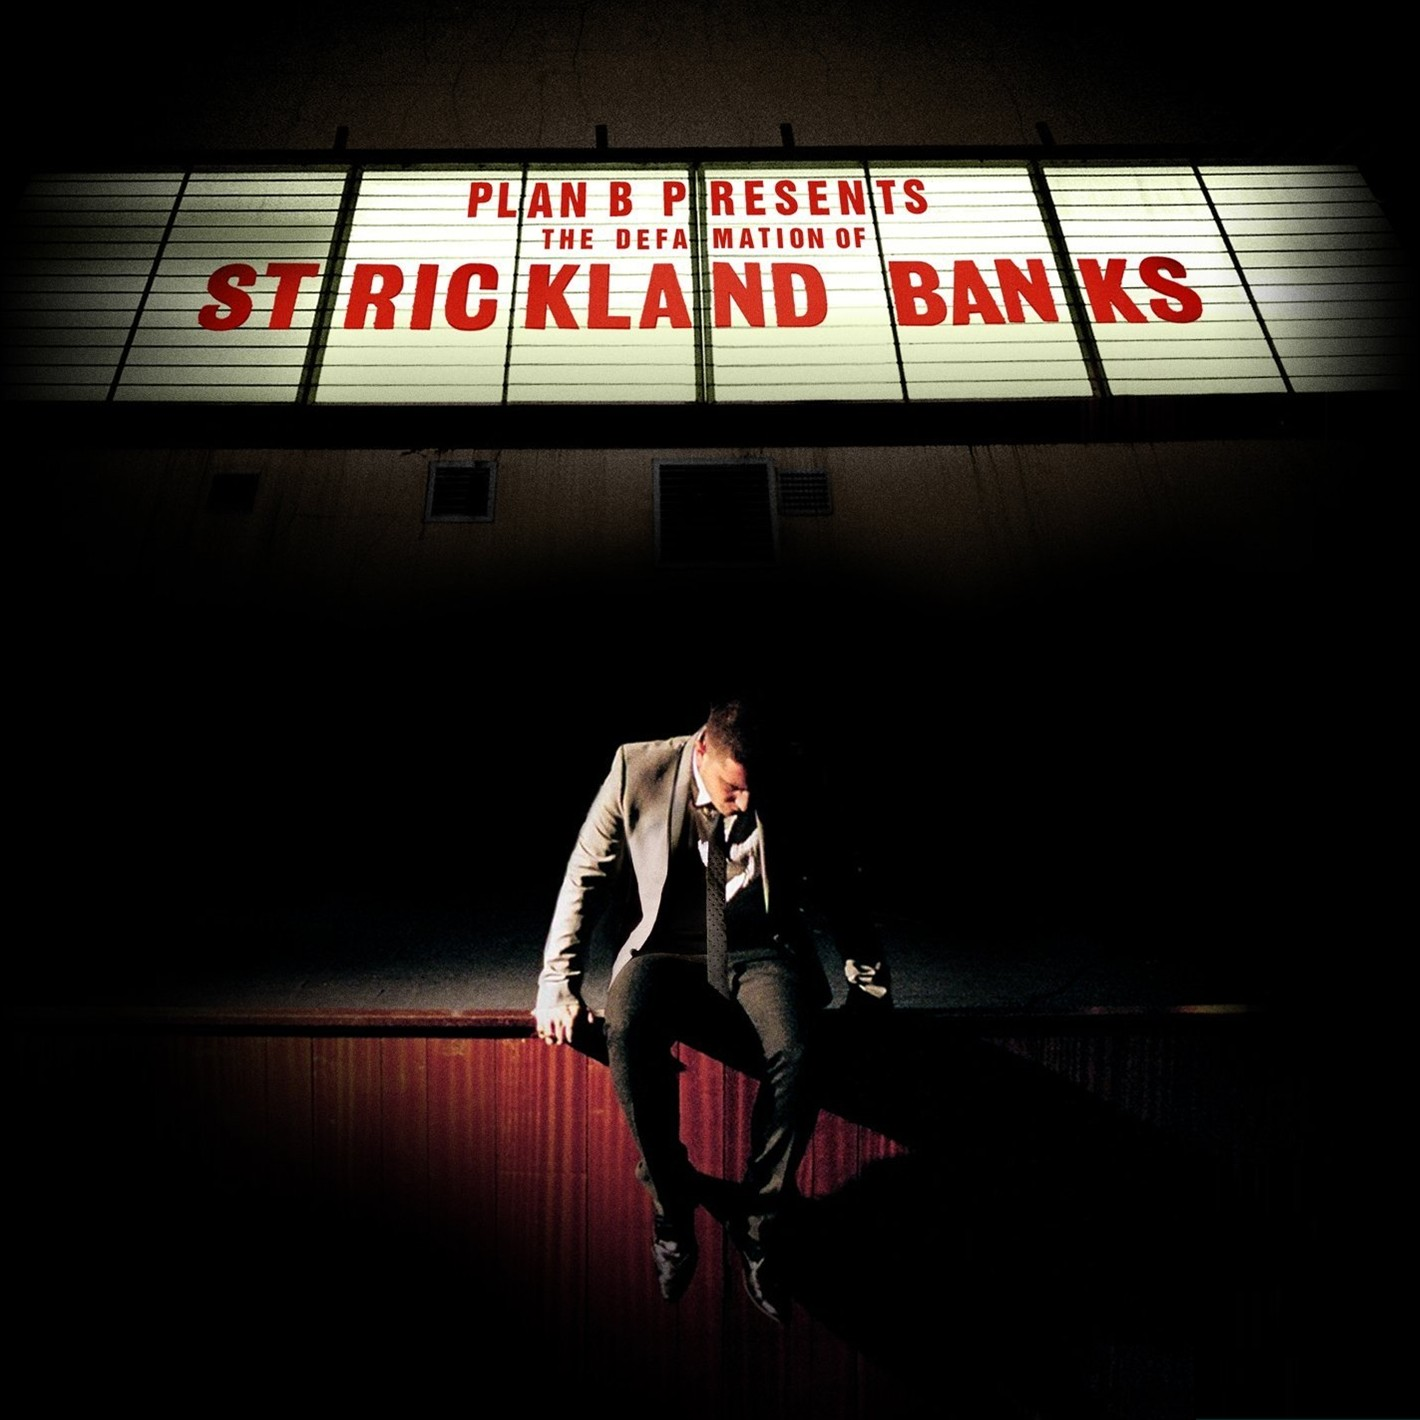 plan_b_the_defamation_of_strickland_banks_2010_cd-front.jpg